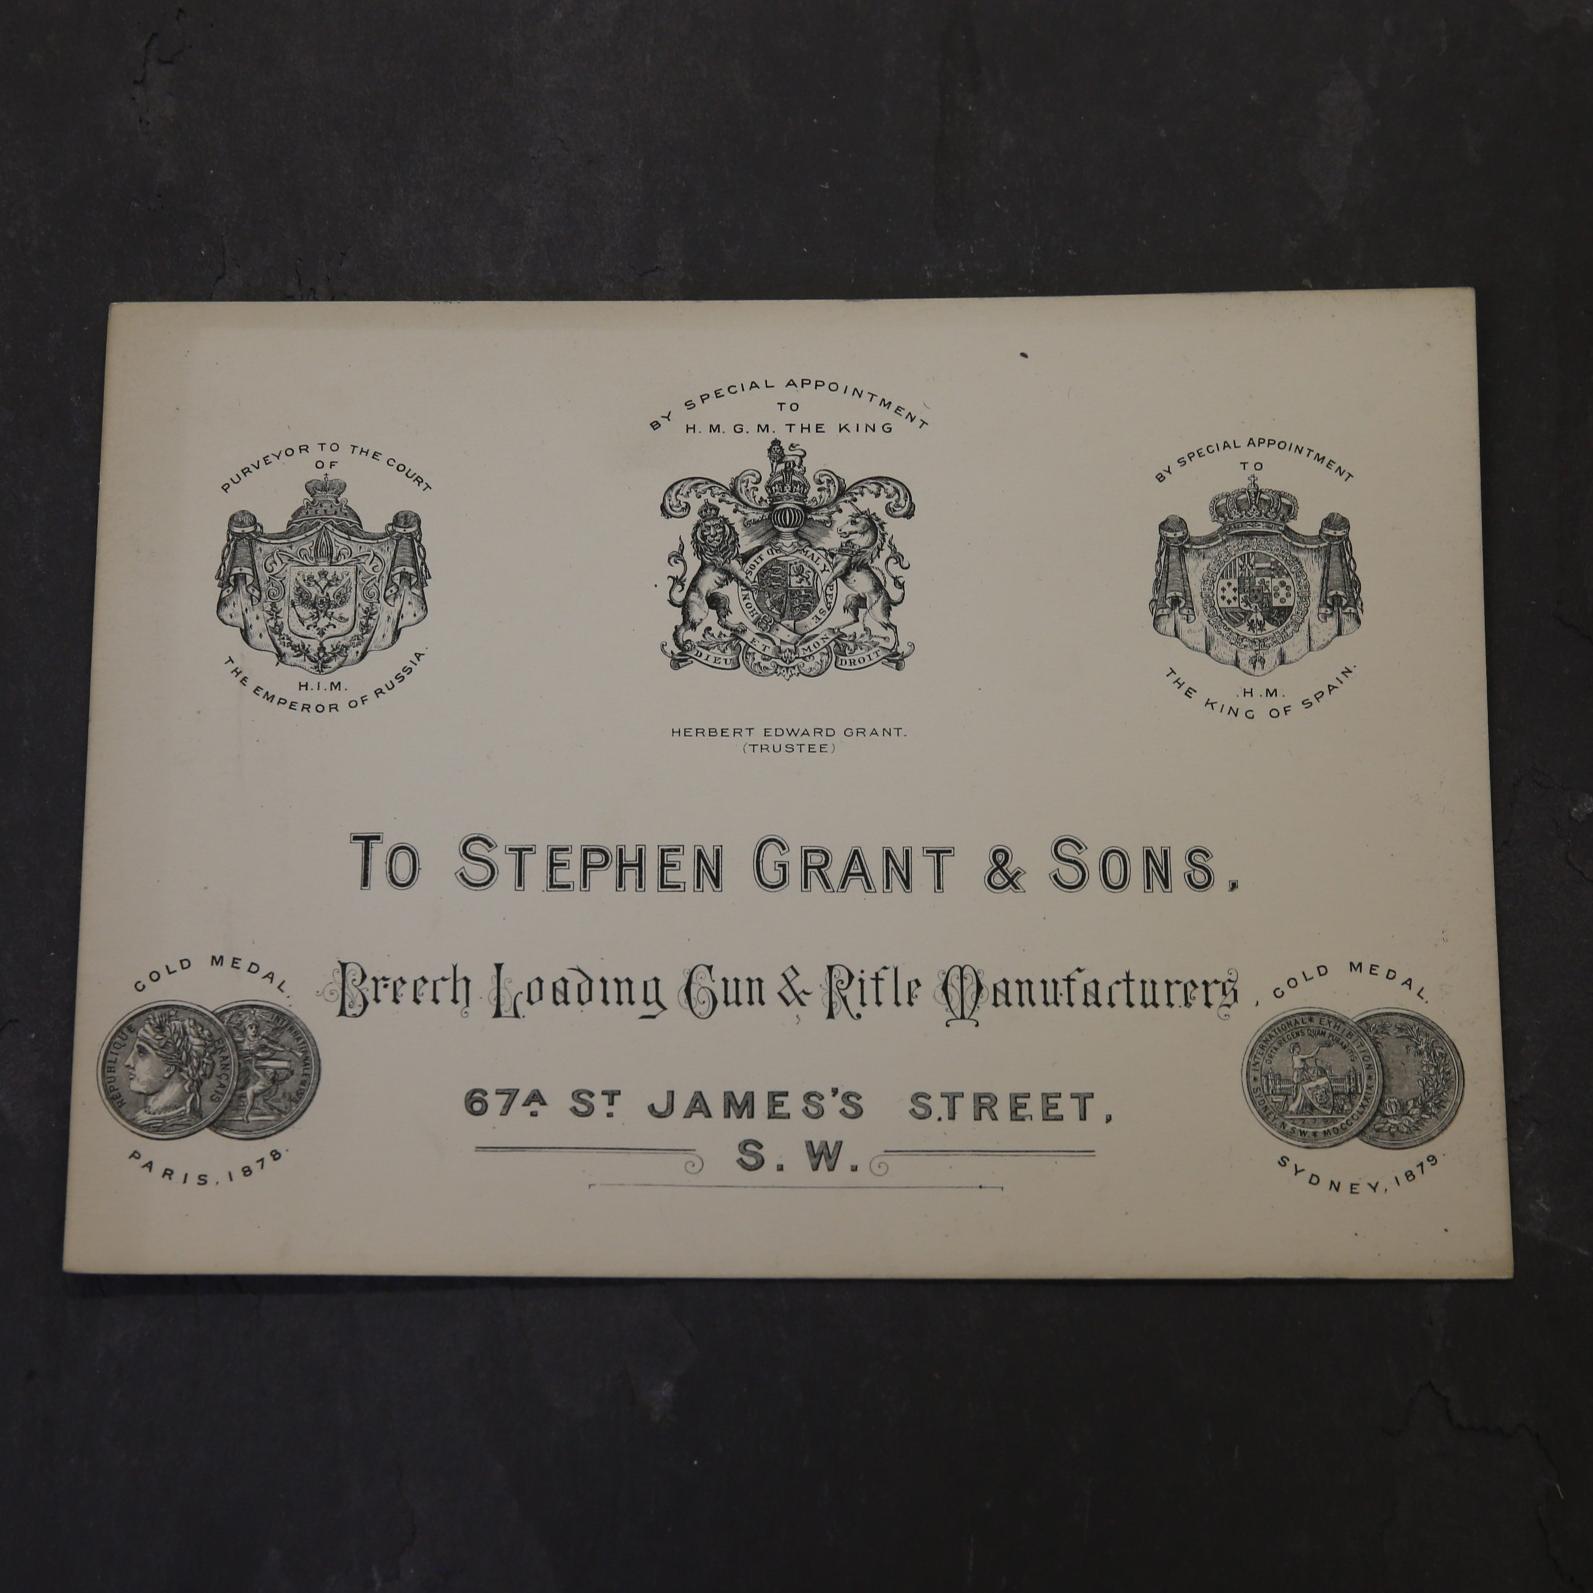 Stephen Grant & Sons Case Label